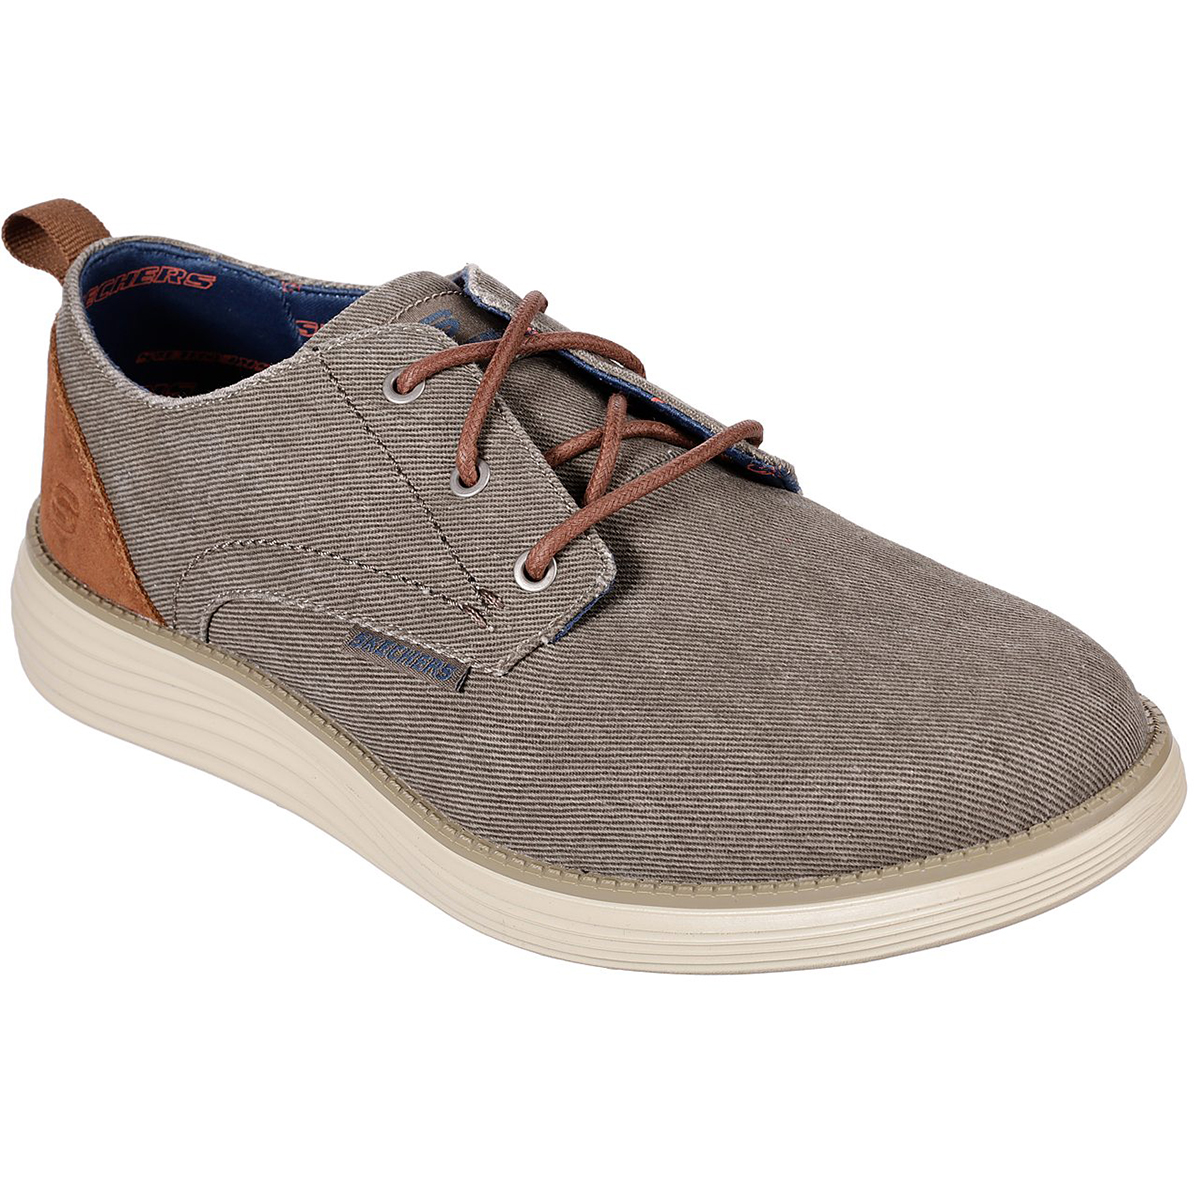 Skechers Men's Status 2.0 Pexton Oxford Shoes - Brown, 9